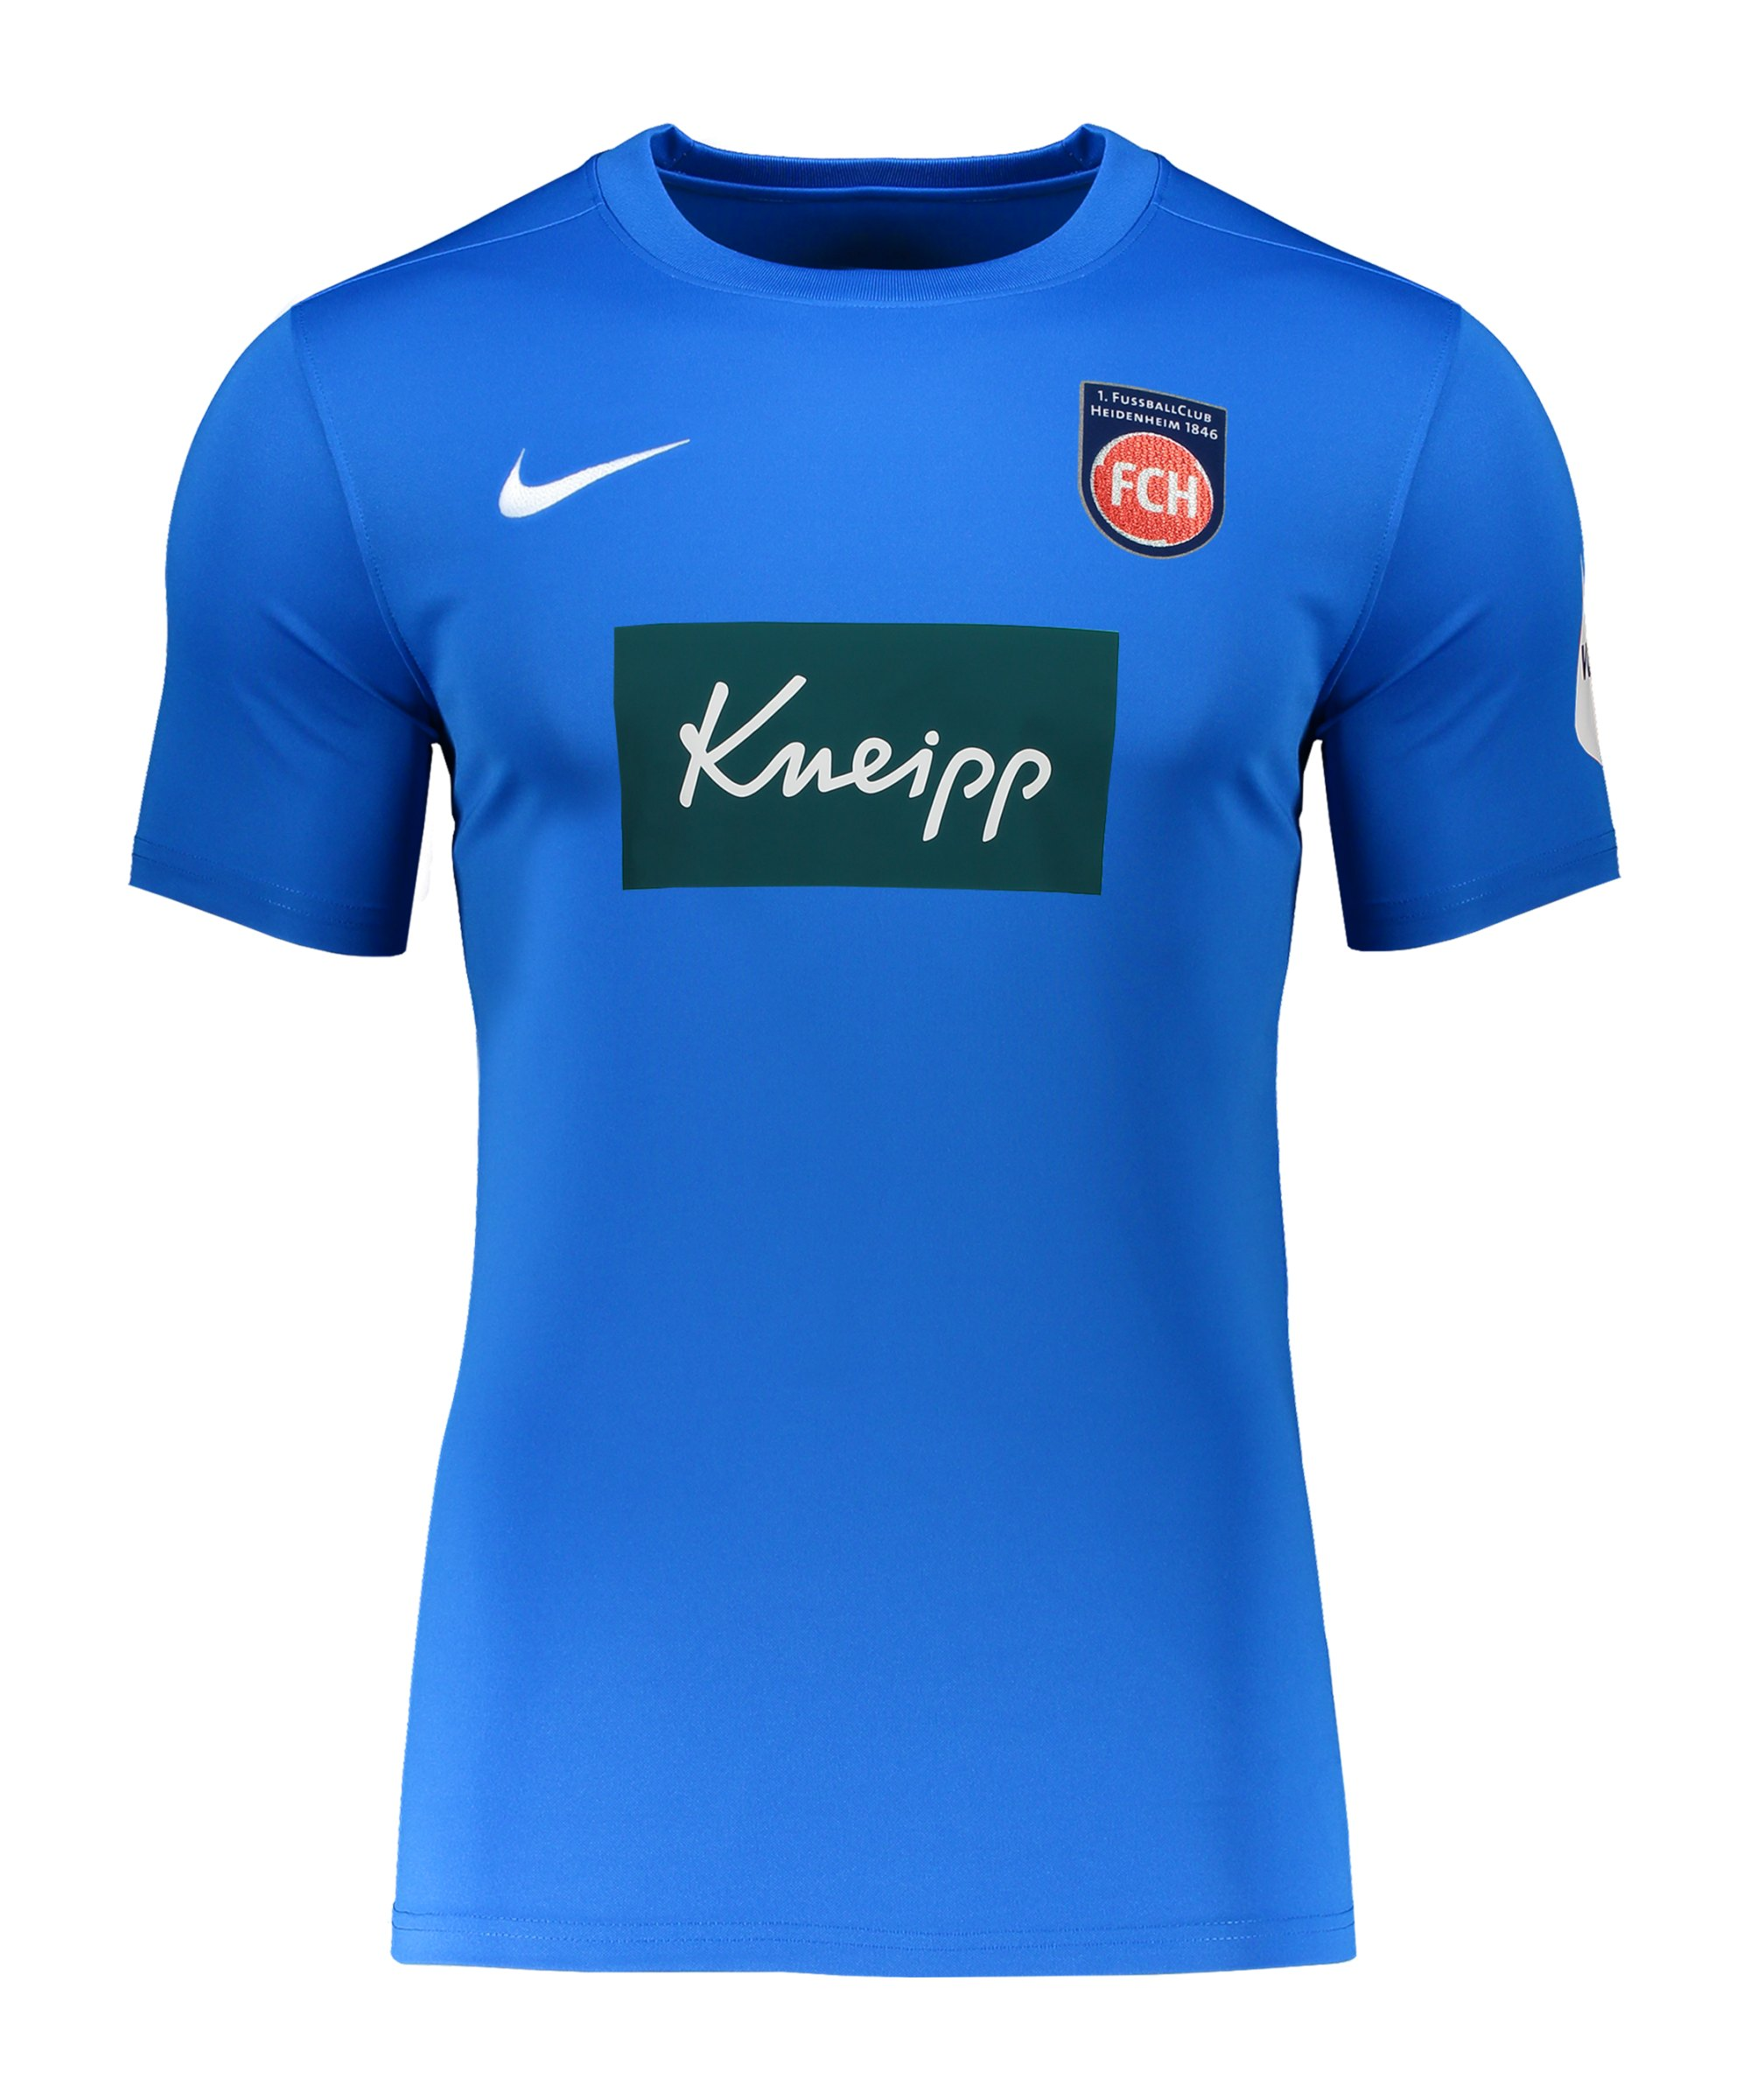 Nike 1. FC Heidenheim Trikot Away 2020/2021 F463 - blau